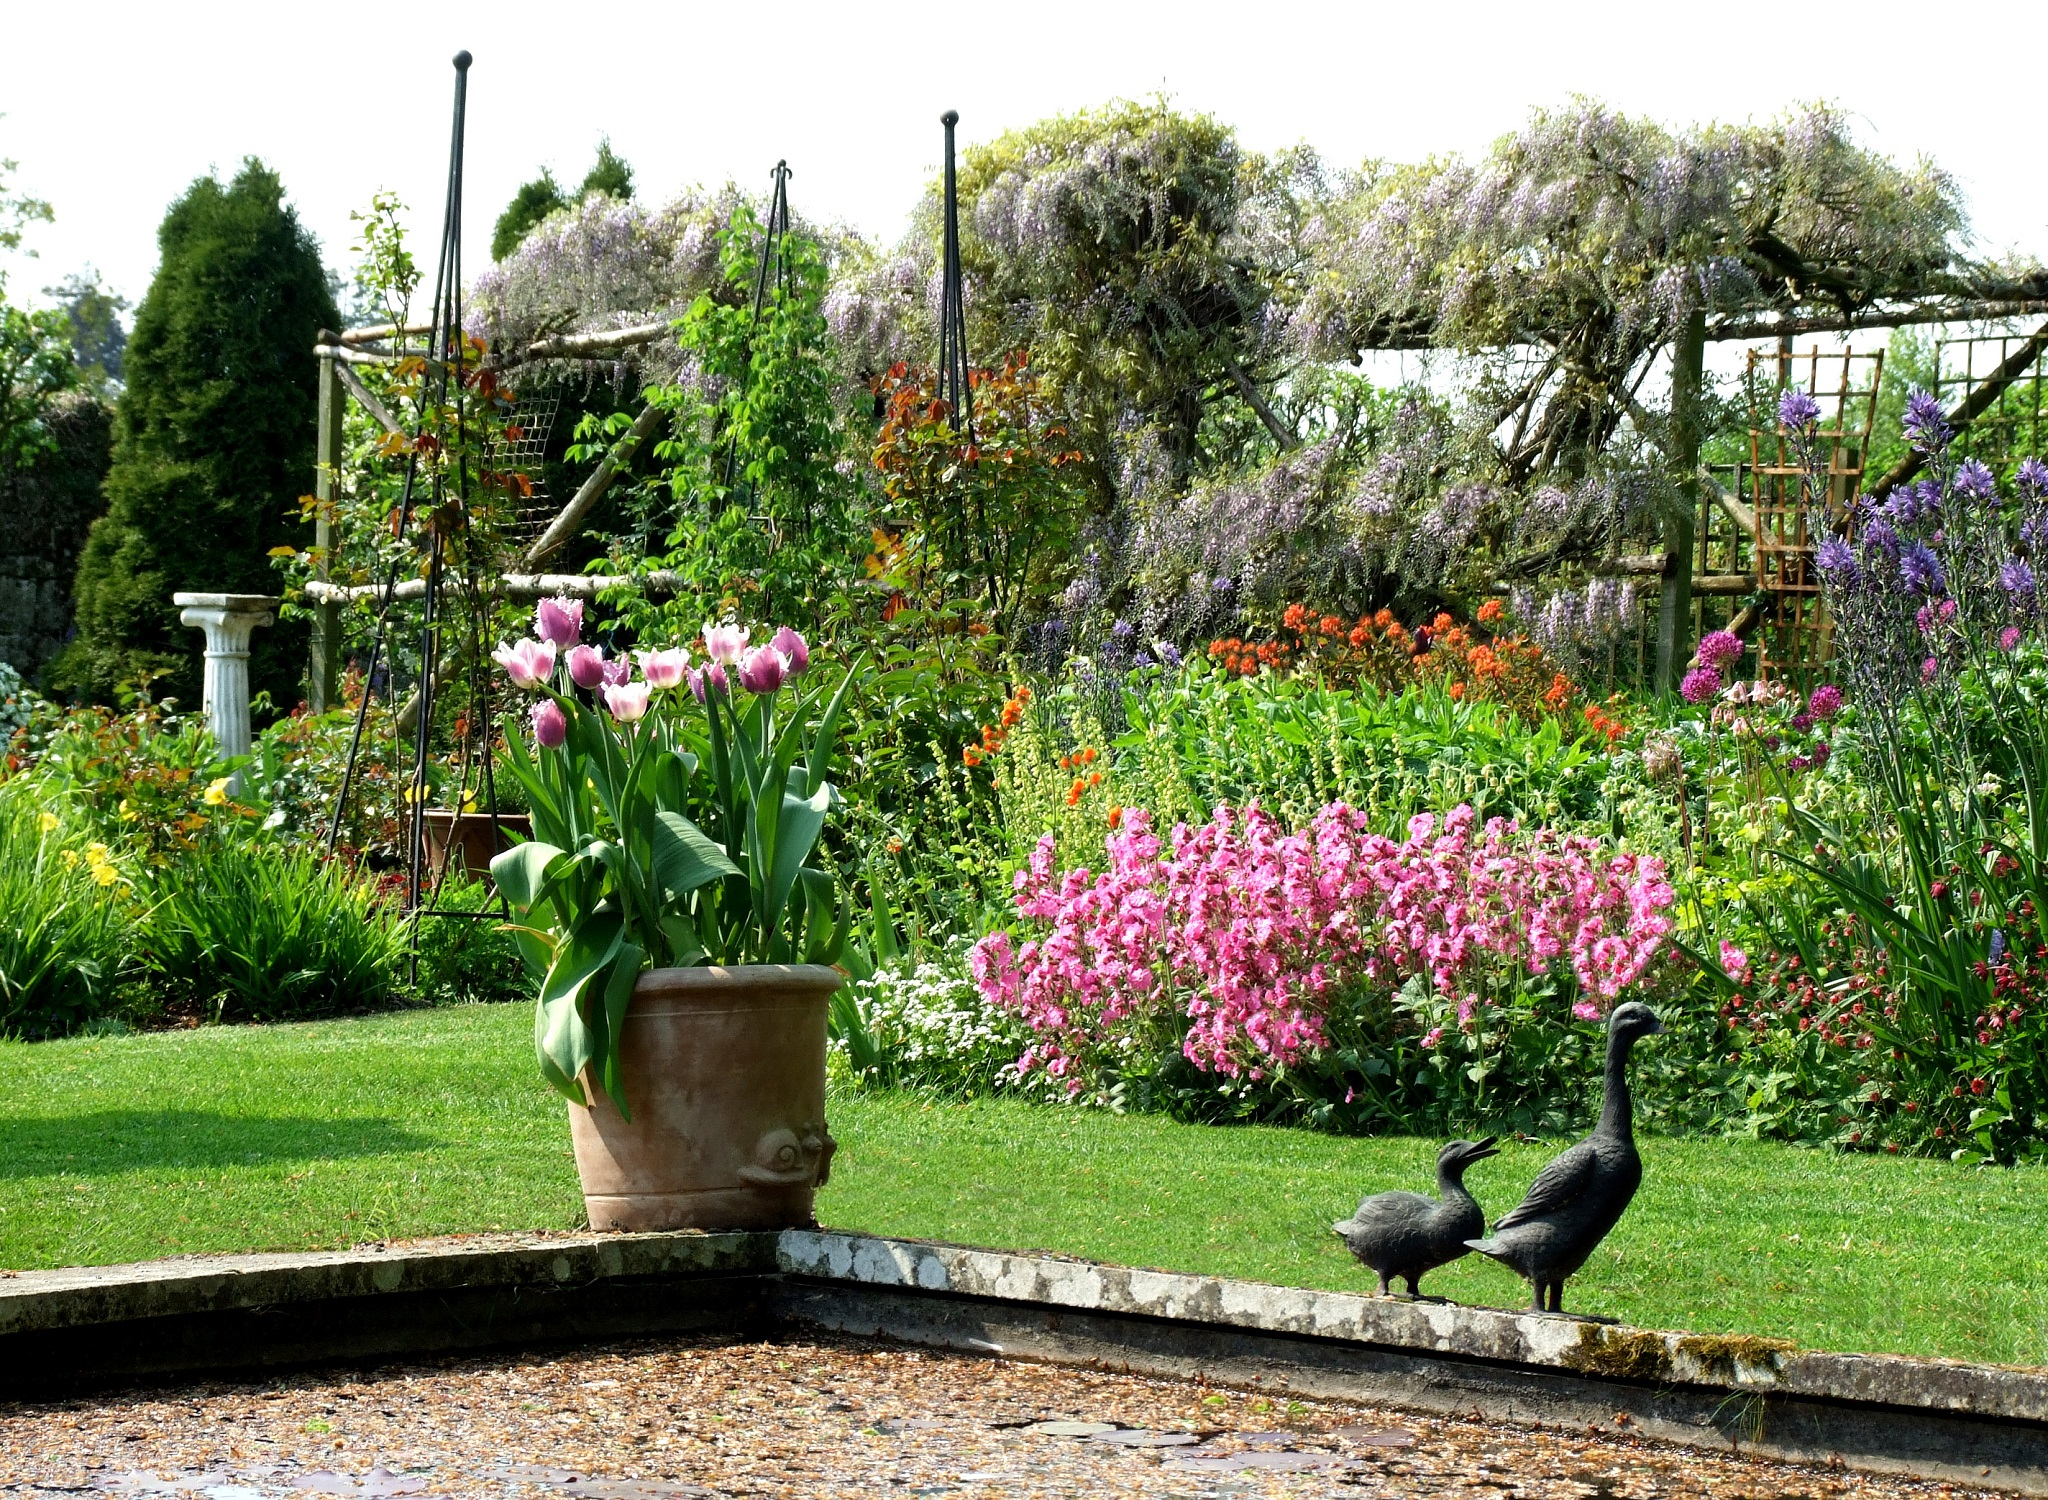 Carlow Garden Trial